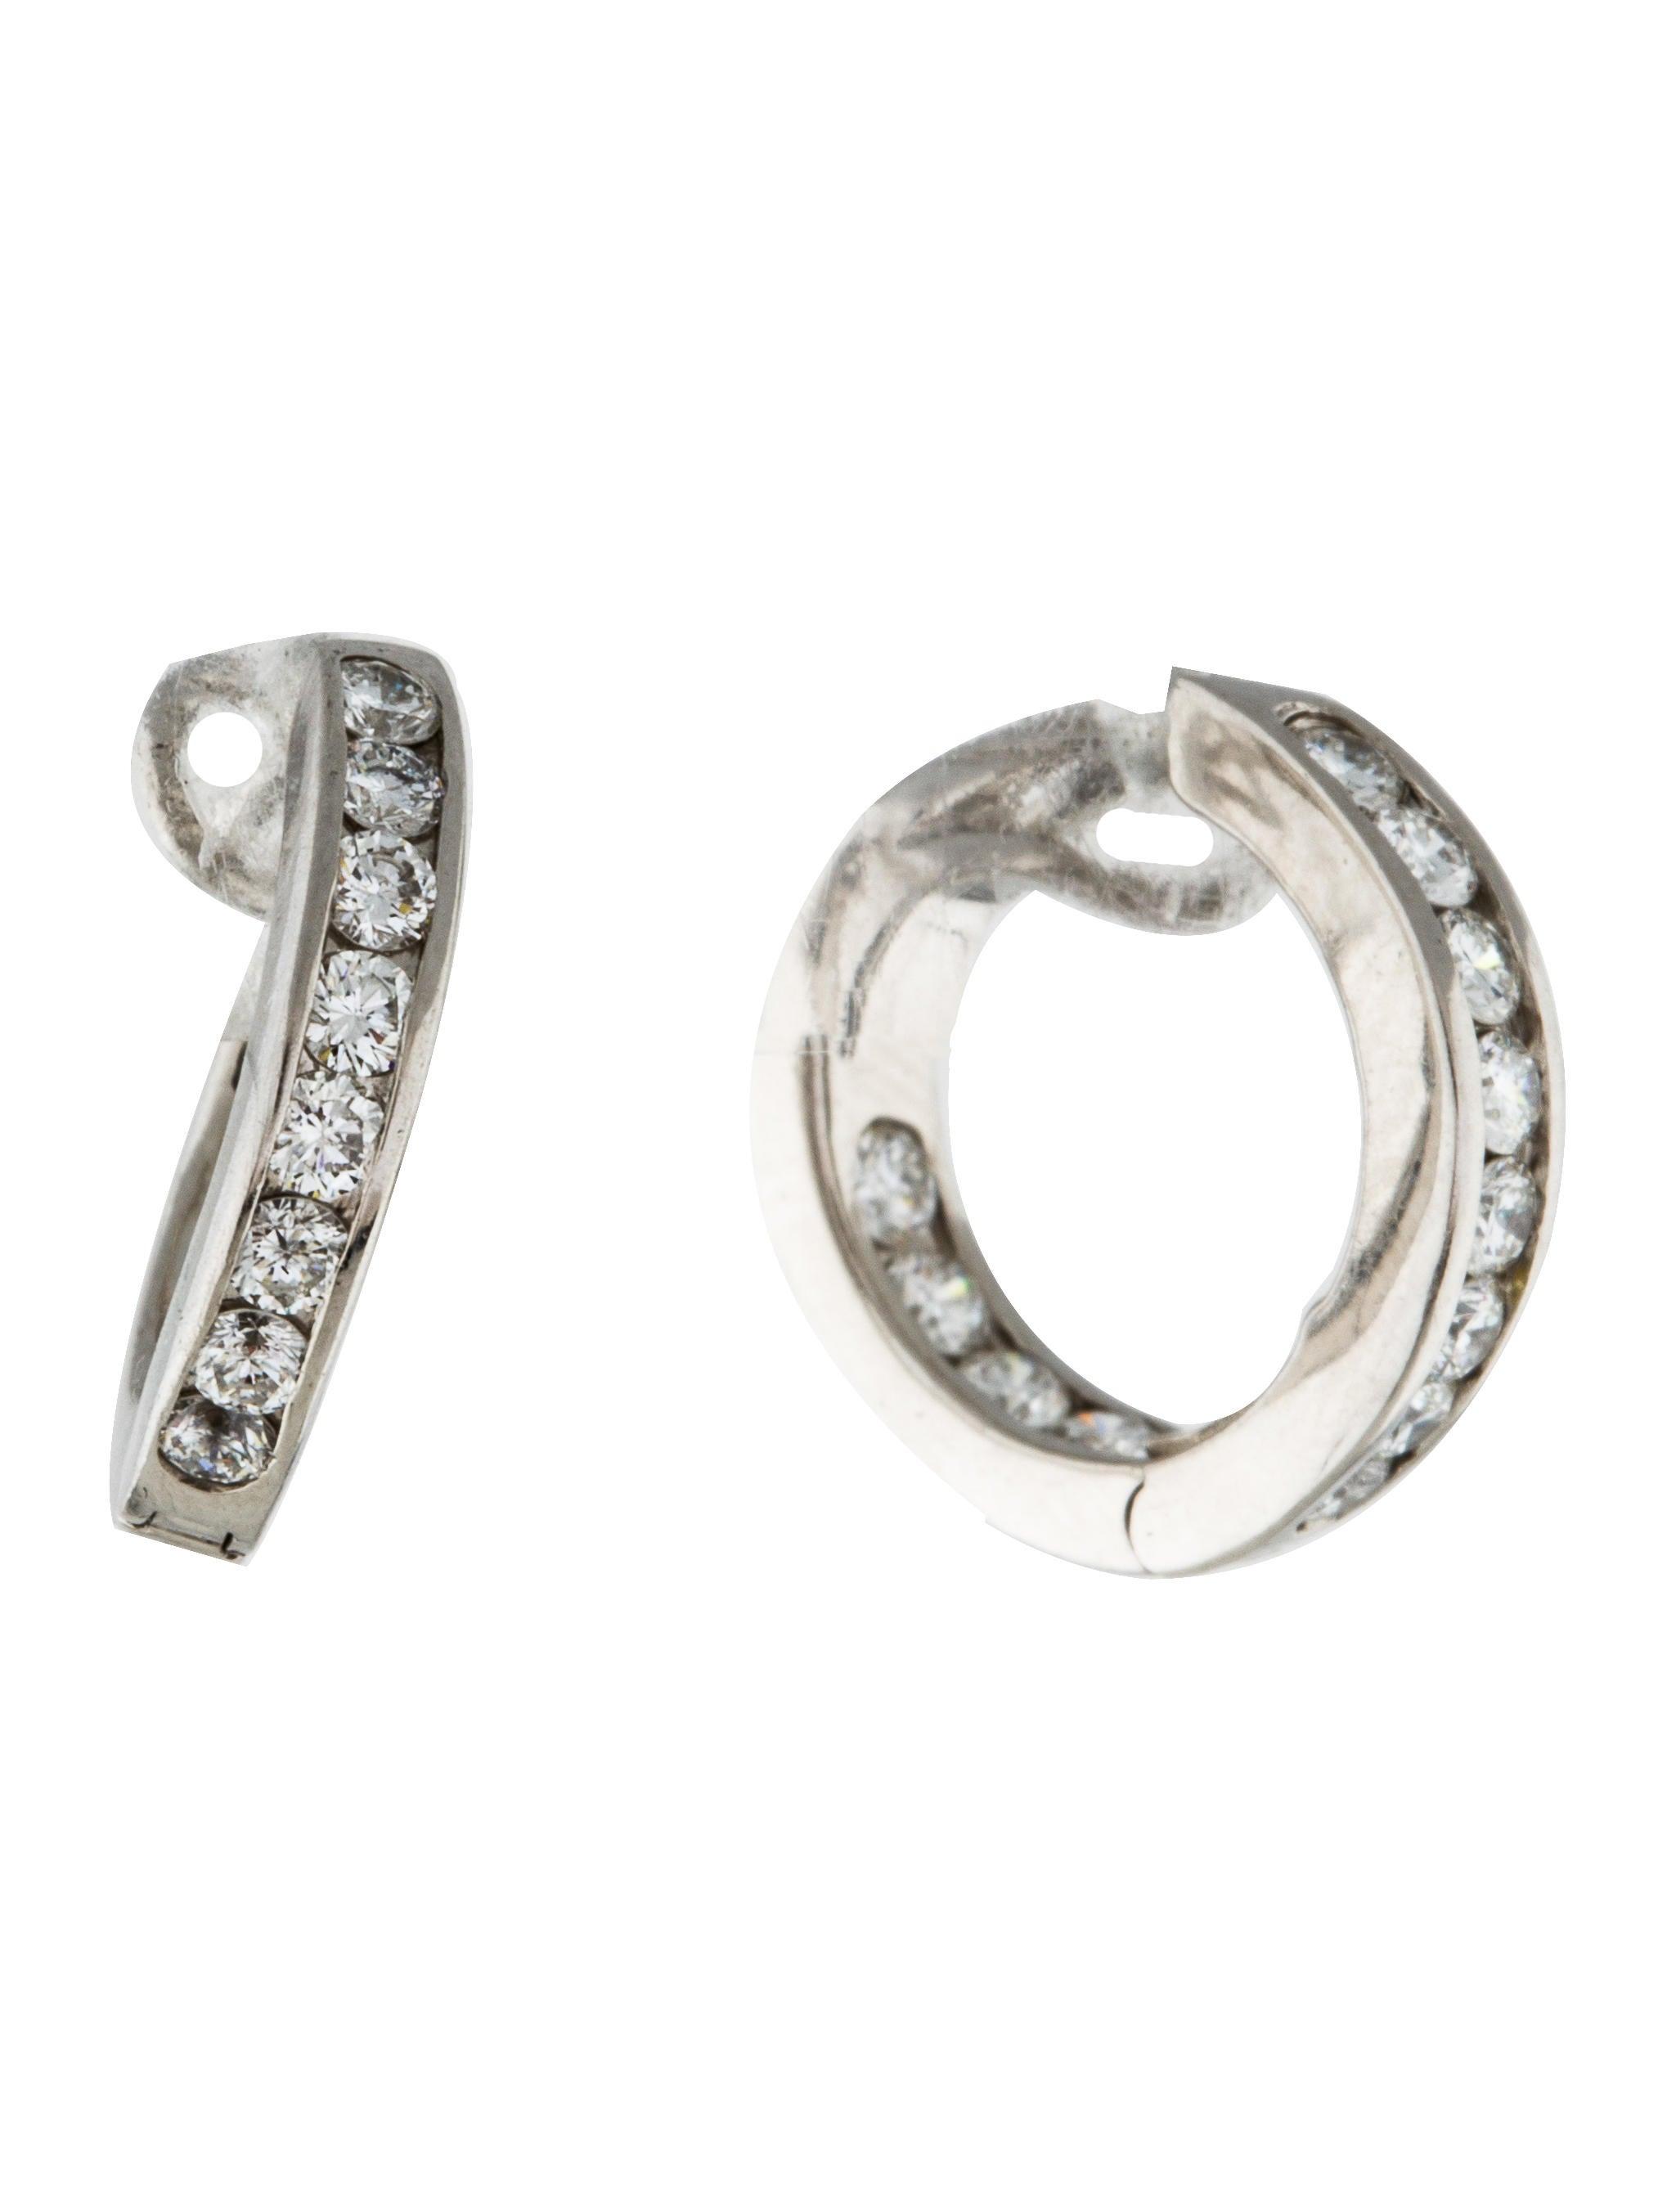 Tiffany & Co Platinum Diamond Hoop Earrings  Earrings. March Bracelet. Yellow Sapphire Earrings. Cushion Engagement Rings. Multi Bangle Bracelets. Steel Bracelet Watches. Casual Rings. Simple Gold Engagement Rings. Marquise Diamond Rings